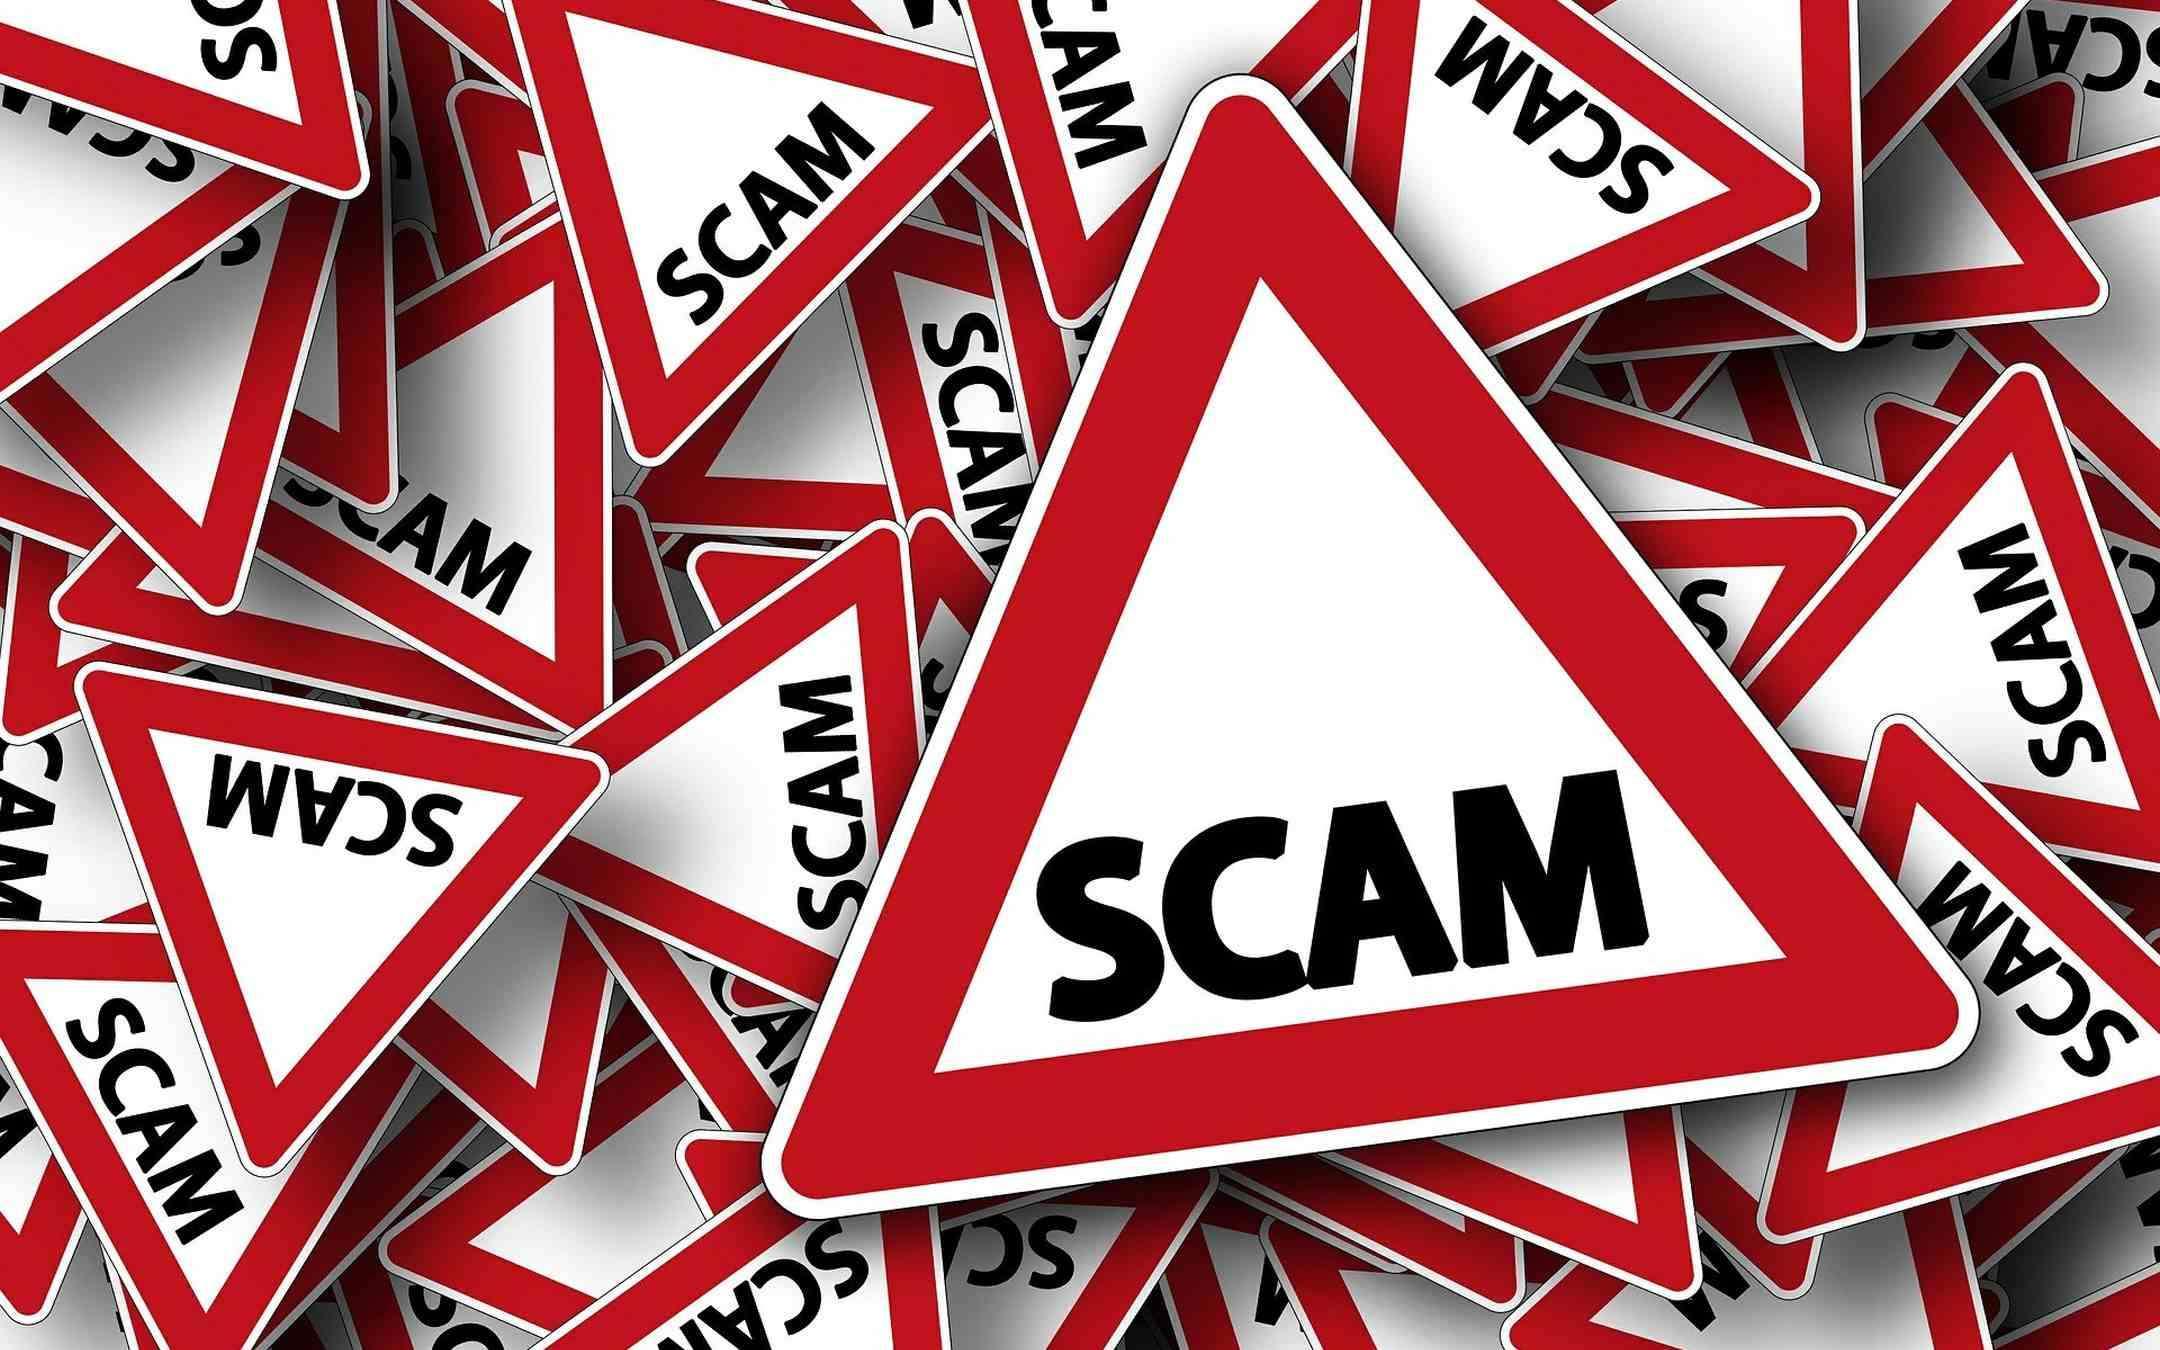 Apple App Store, many million dollar scam apps